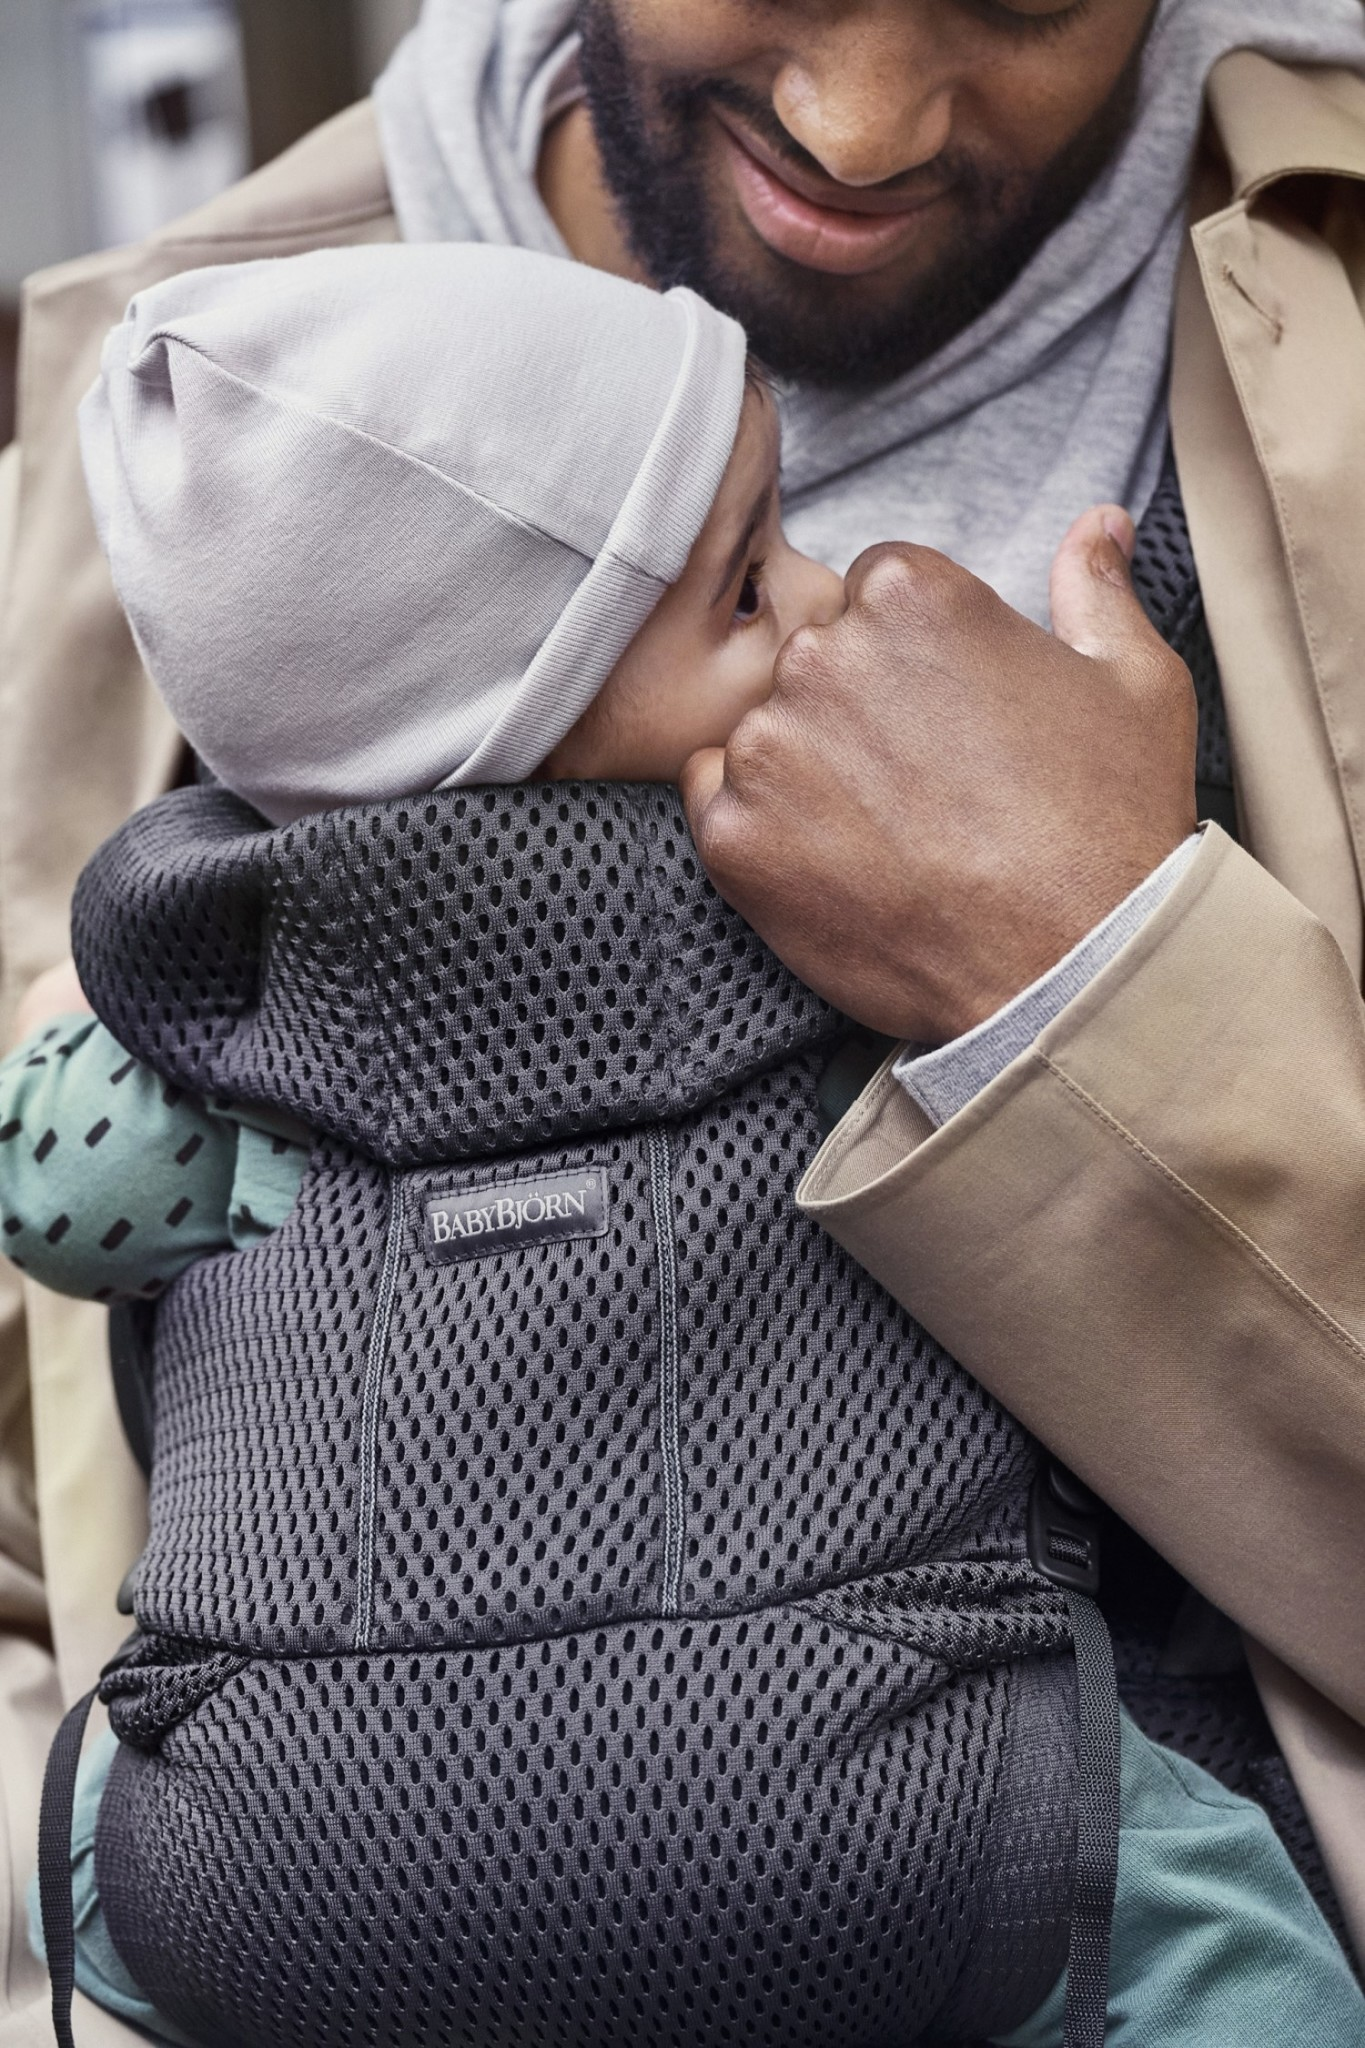 BABYBJÖRN BabyBjörn Draagzak MOVE Antraciet 3D Mesh